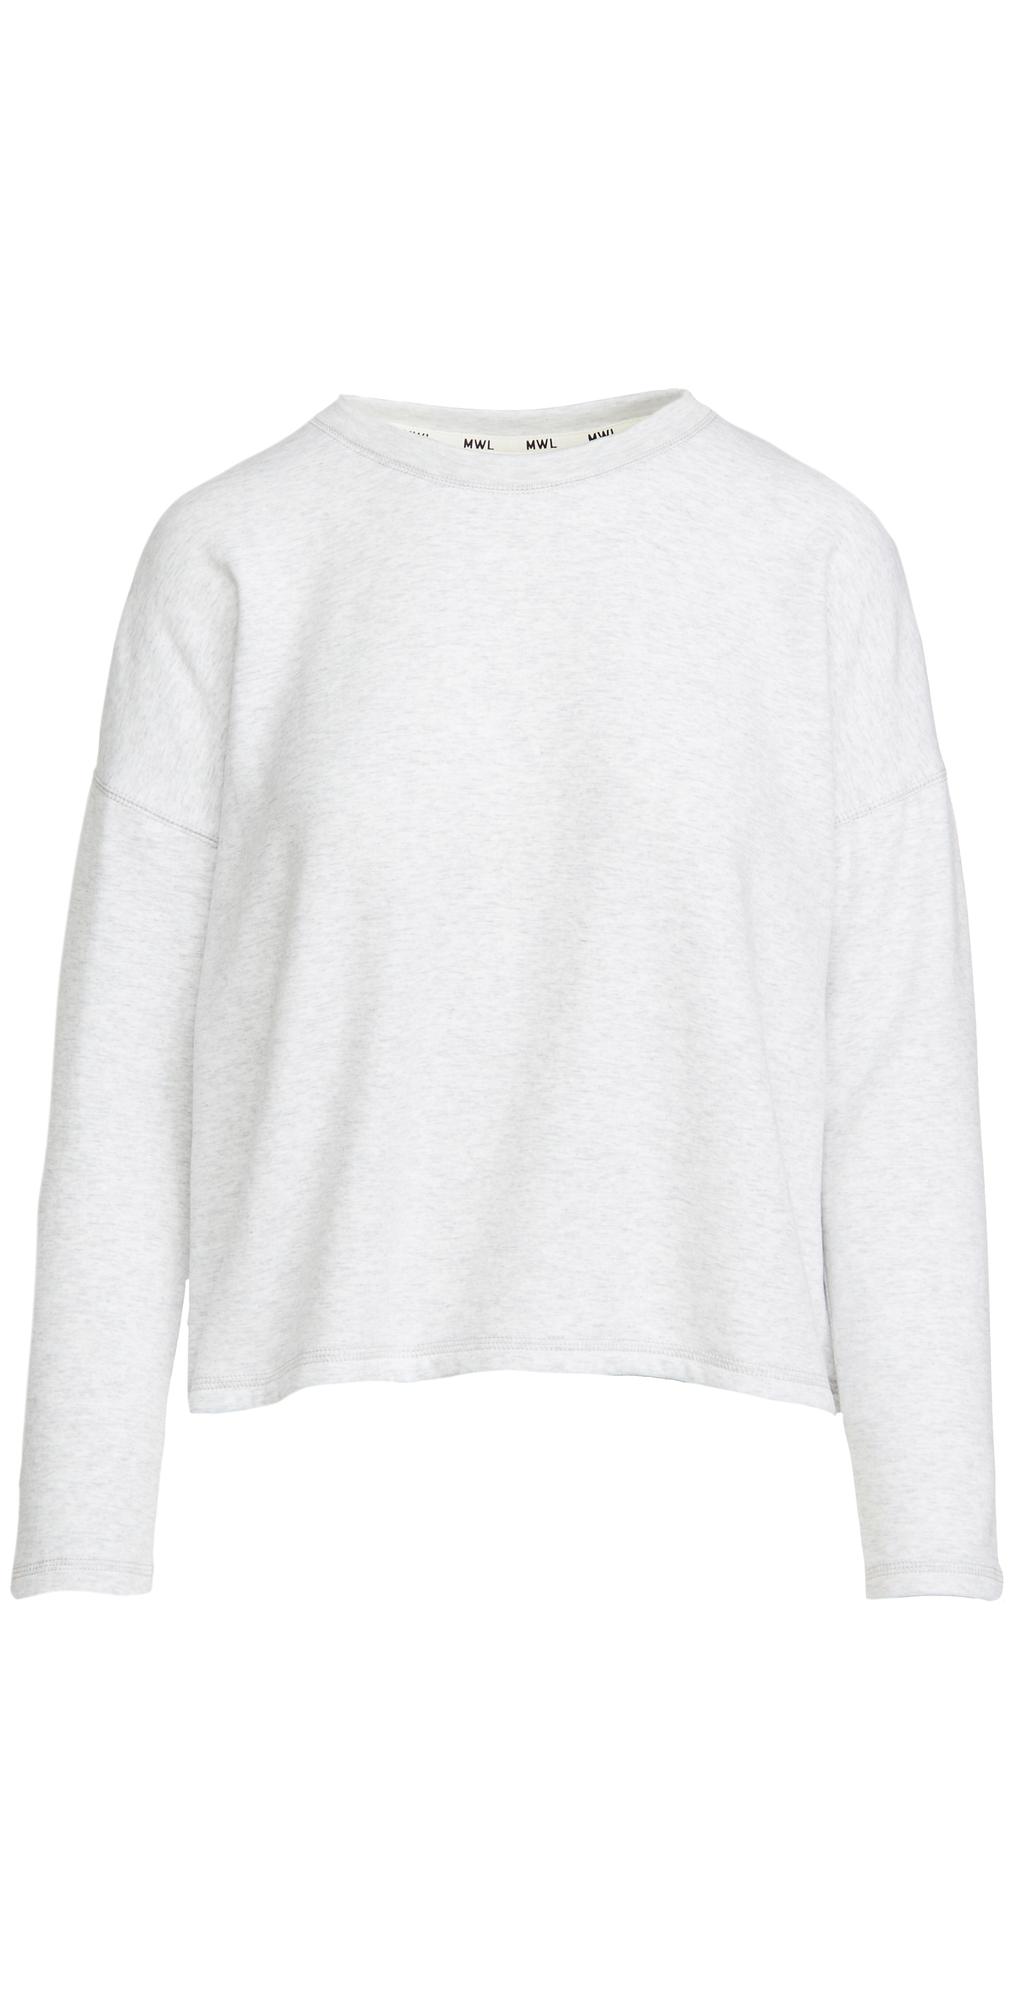 Heathered Perfect Crew Sweatshirt